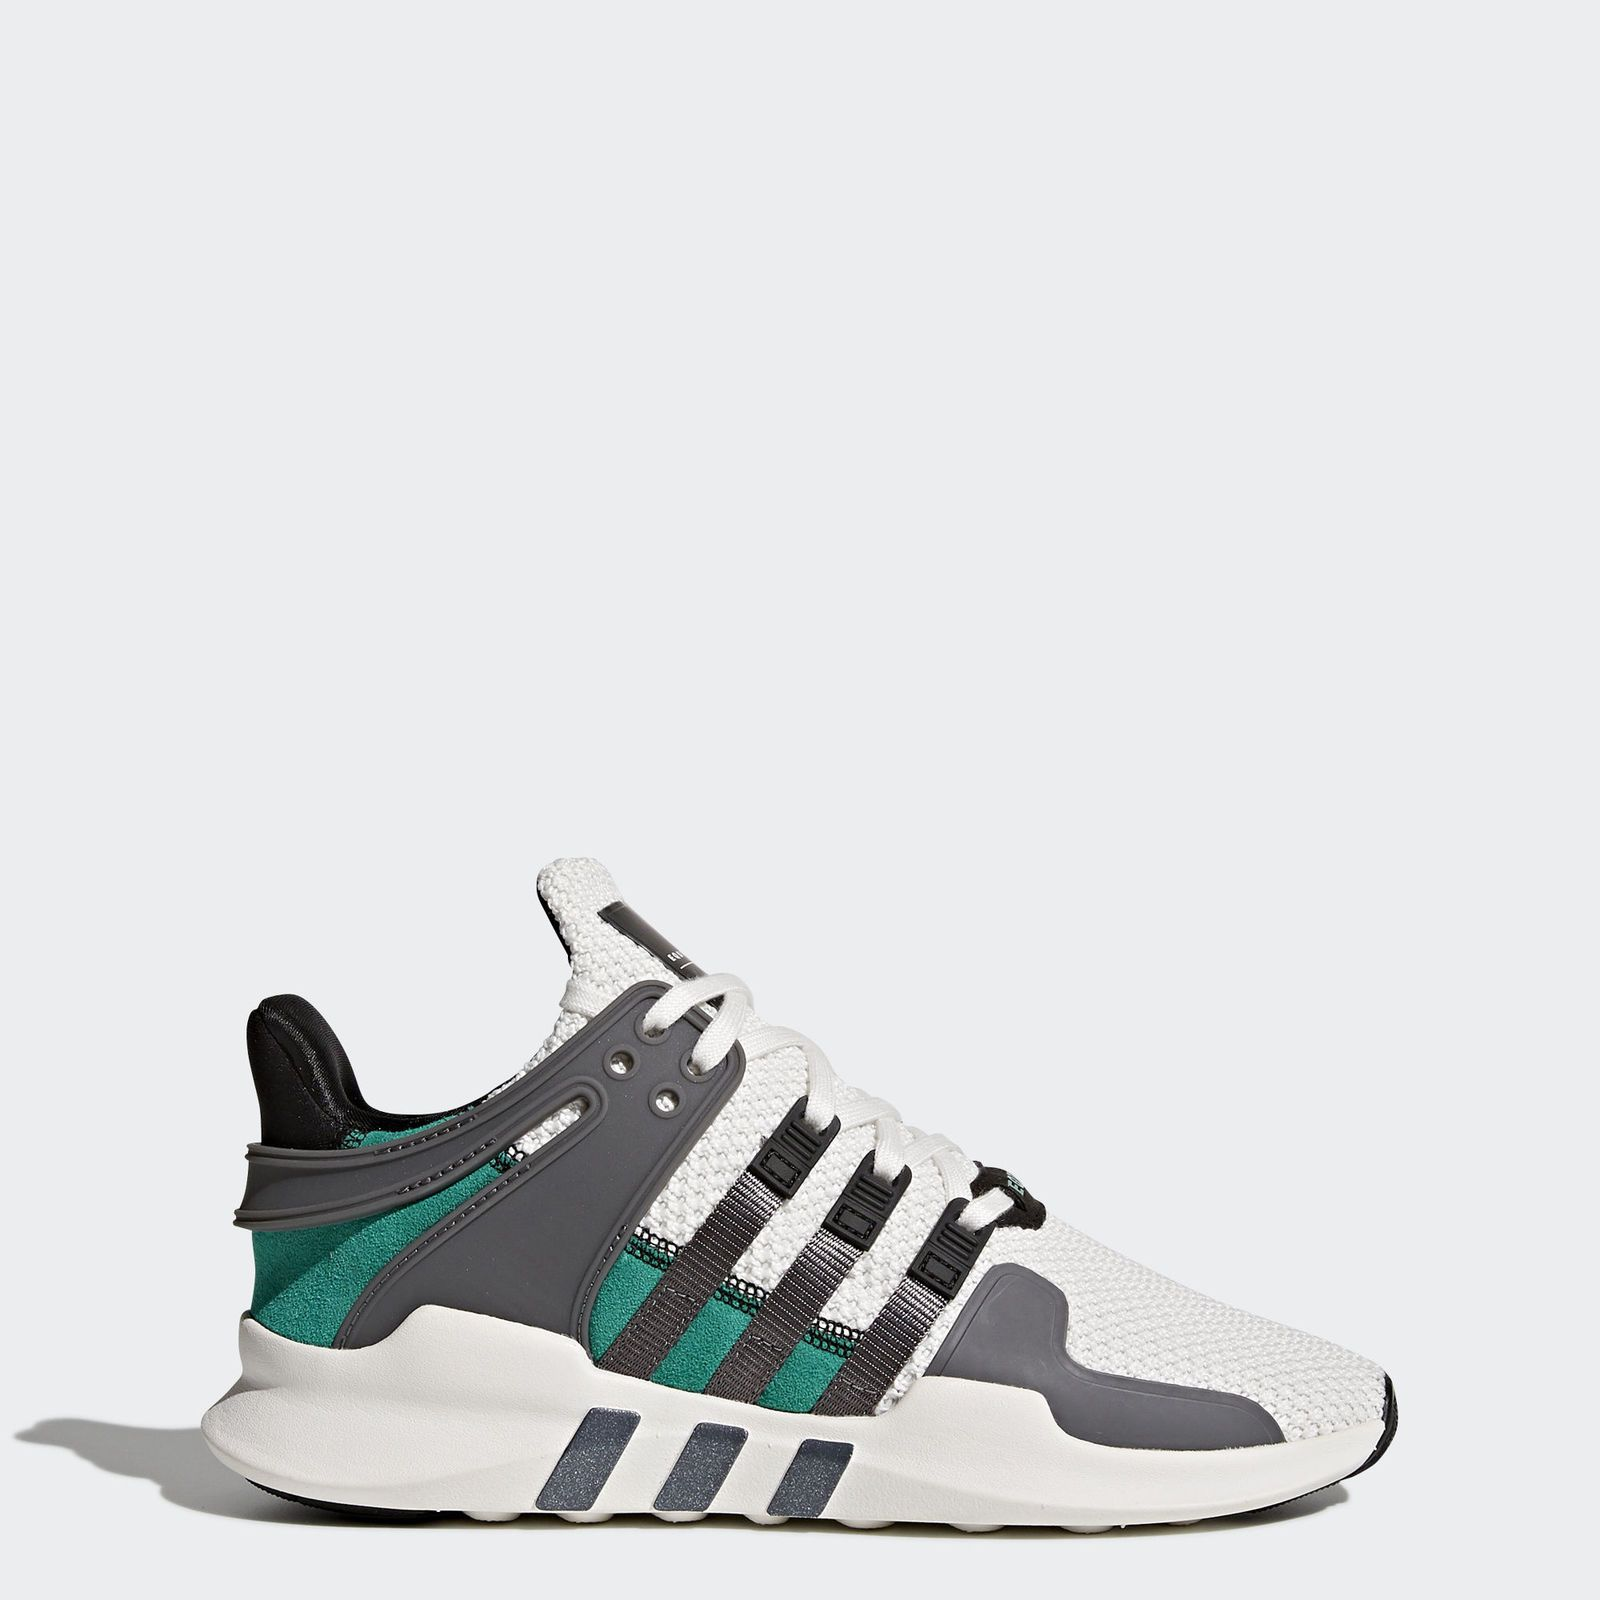 49 Adidas Shoes Women's 99 Adv Support Eqt rnrwqzxOPp